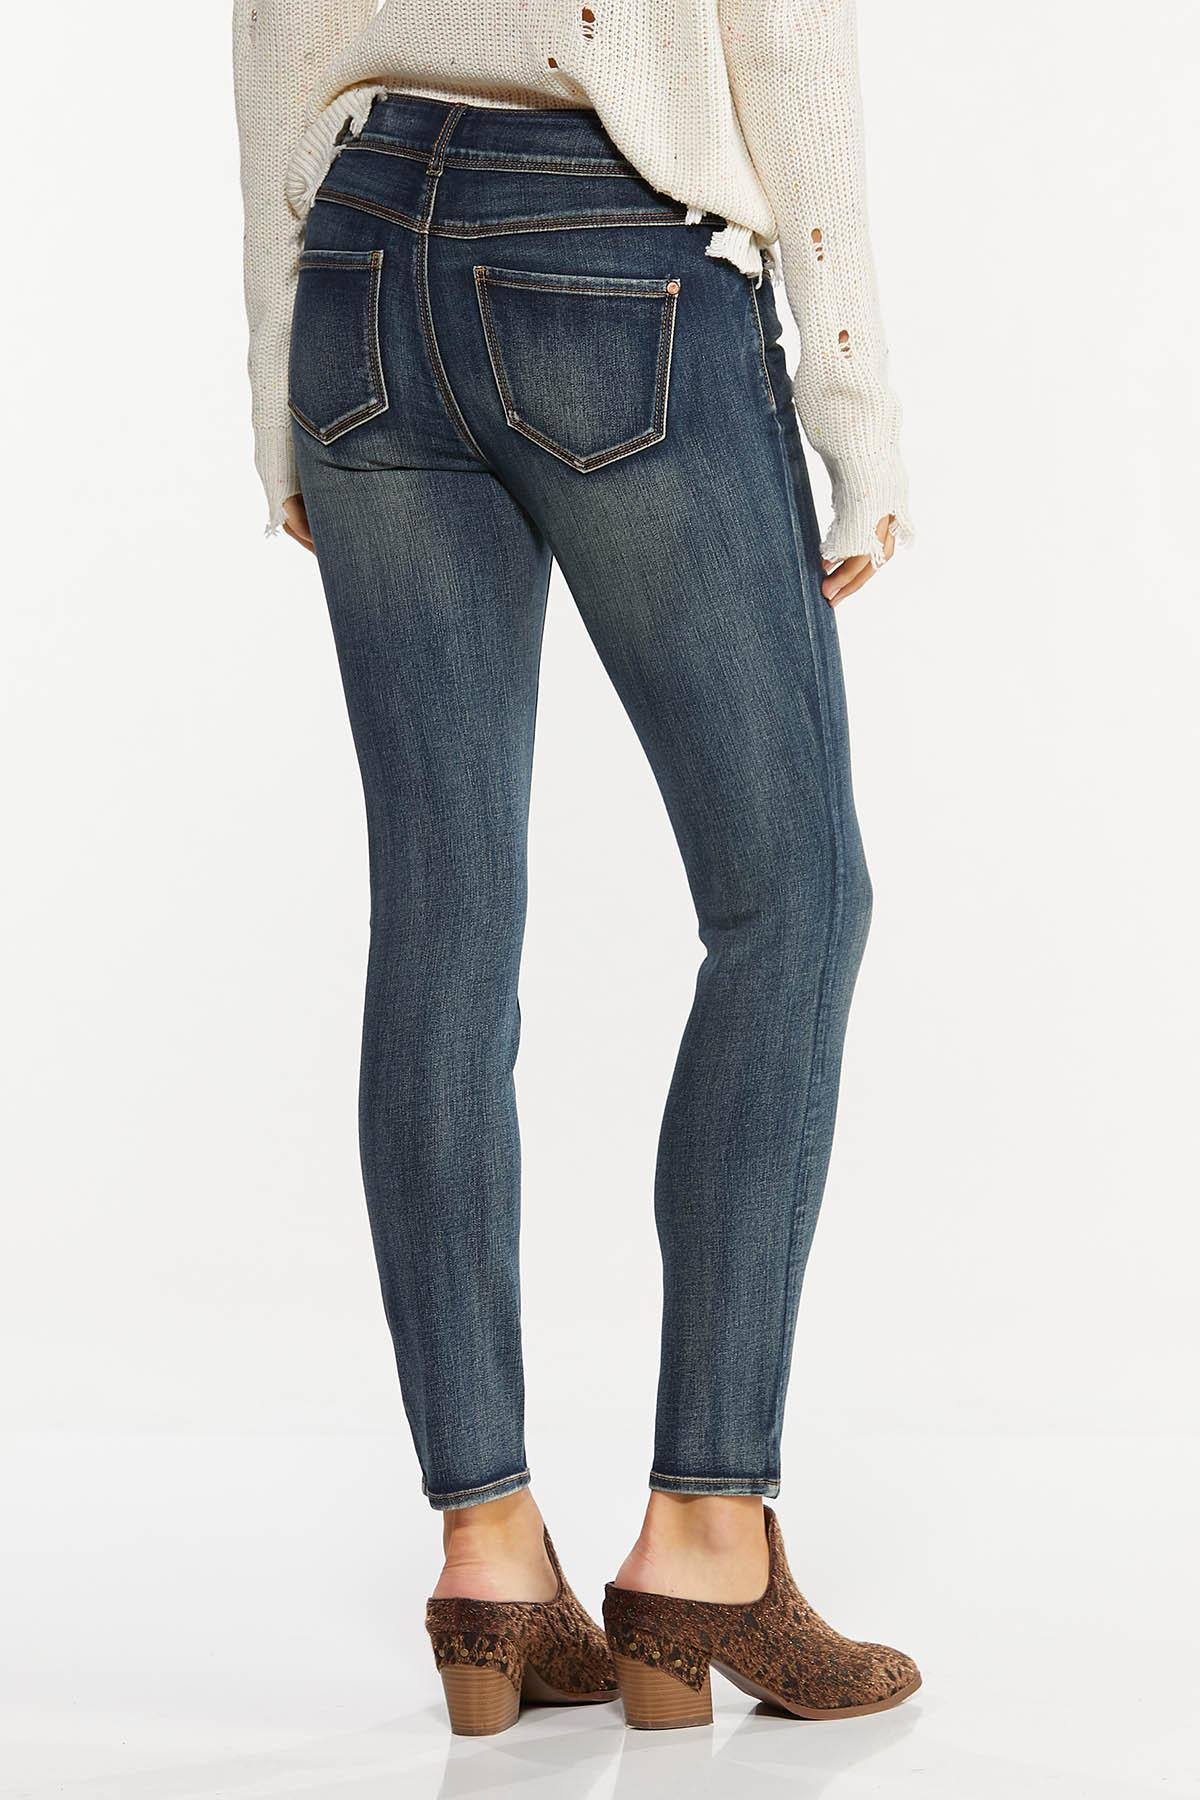 Skinny Shape Enhancing Jeans (Item #44662136)